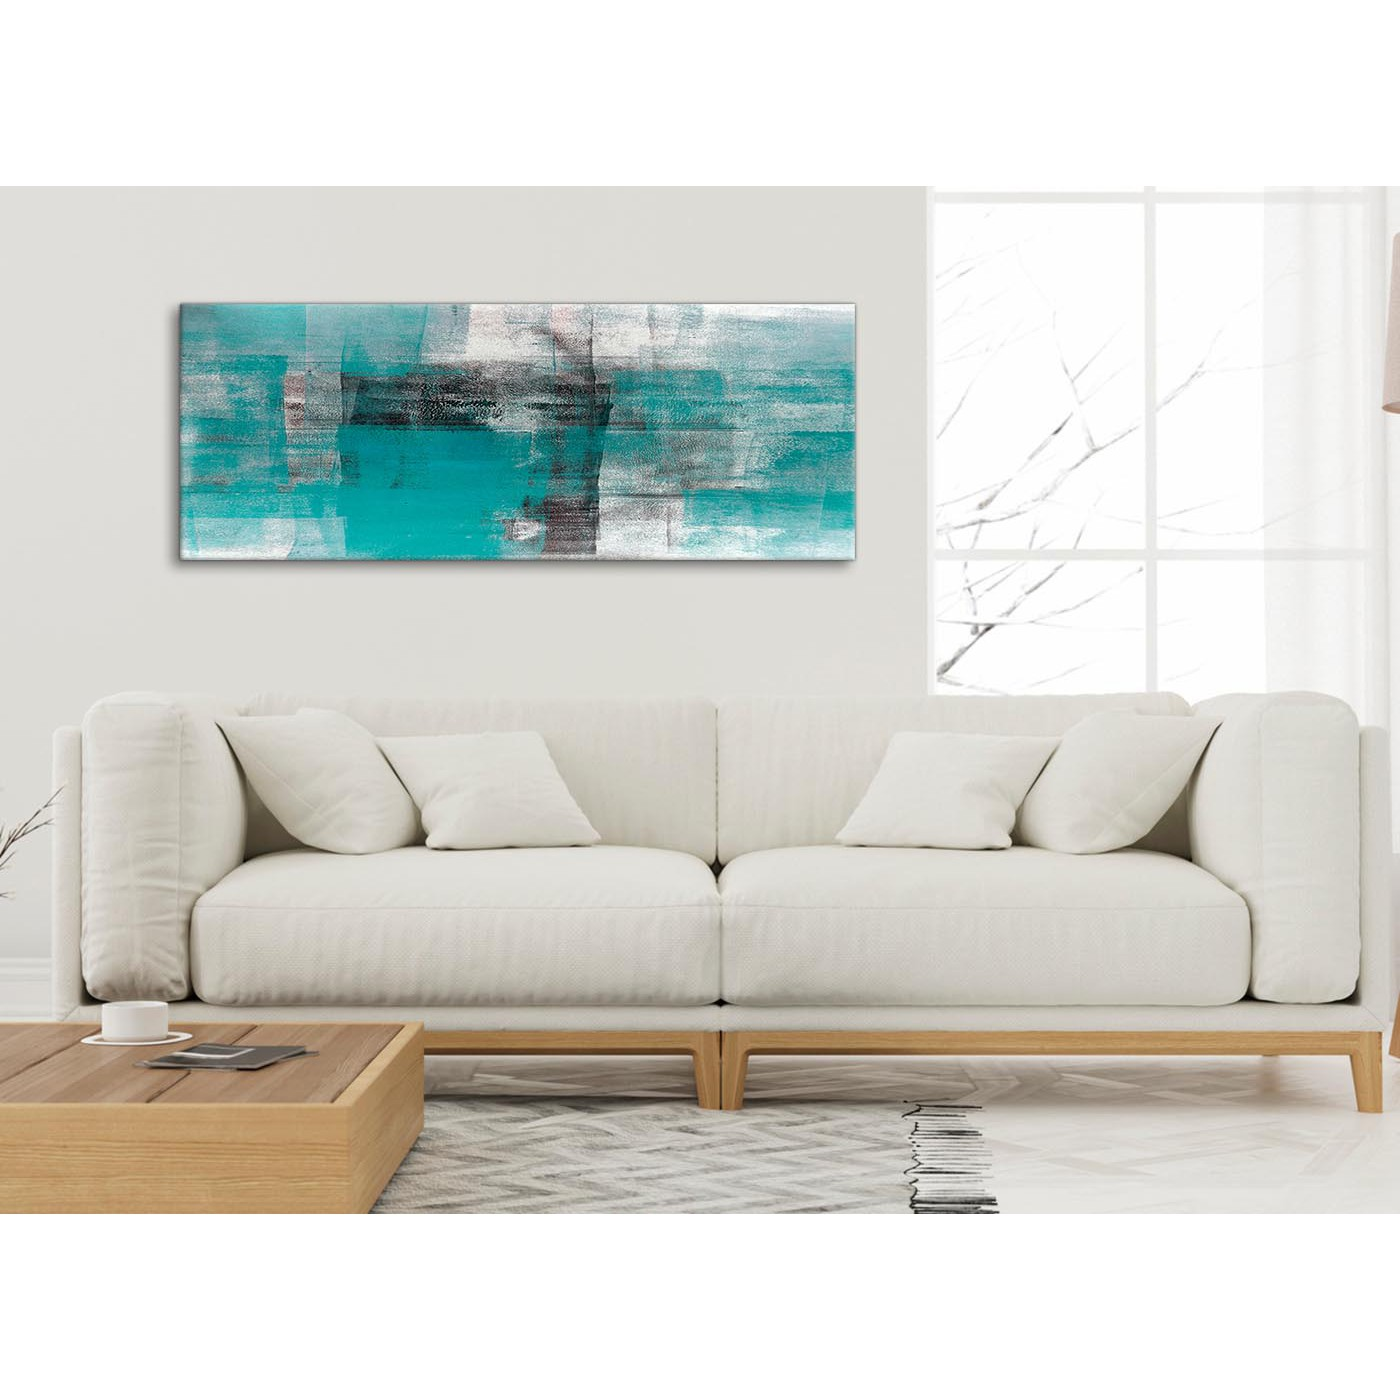 Bedroom Canvas Wall Art Uk: Teal Black White Painting Living Room Canvas Wall Art